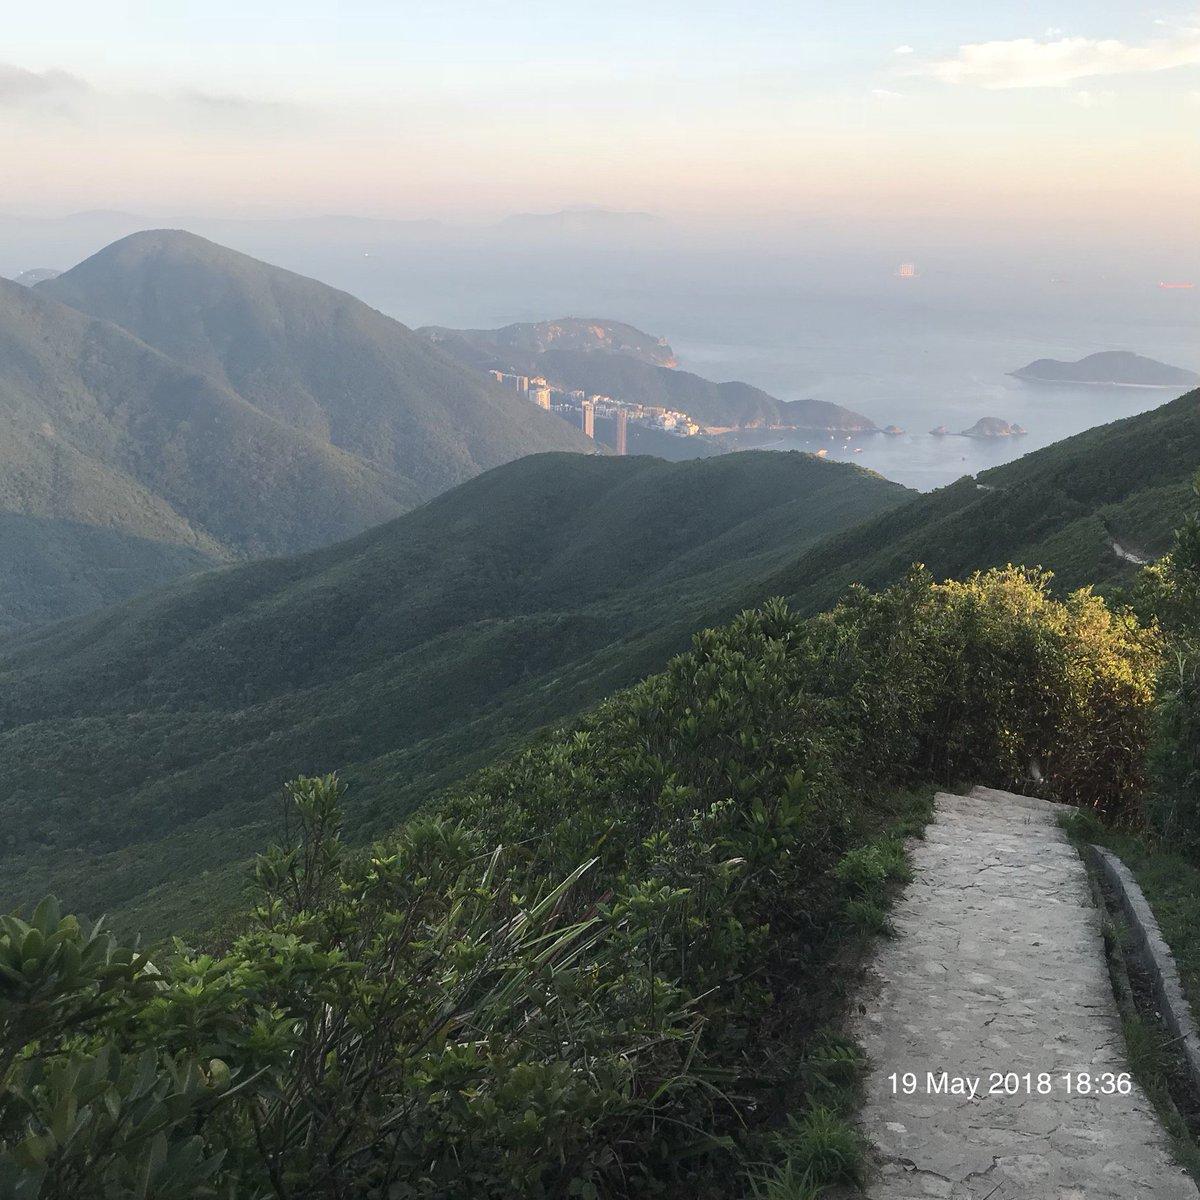 Fooled again by seemingly easy Hong Kong run on Wilson Trail